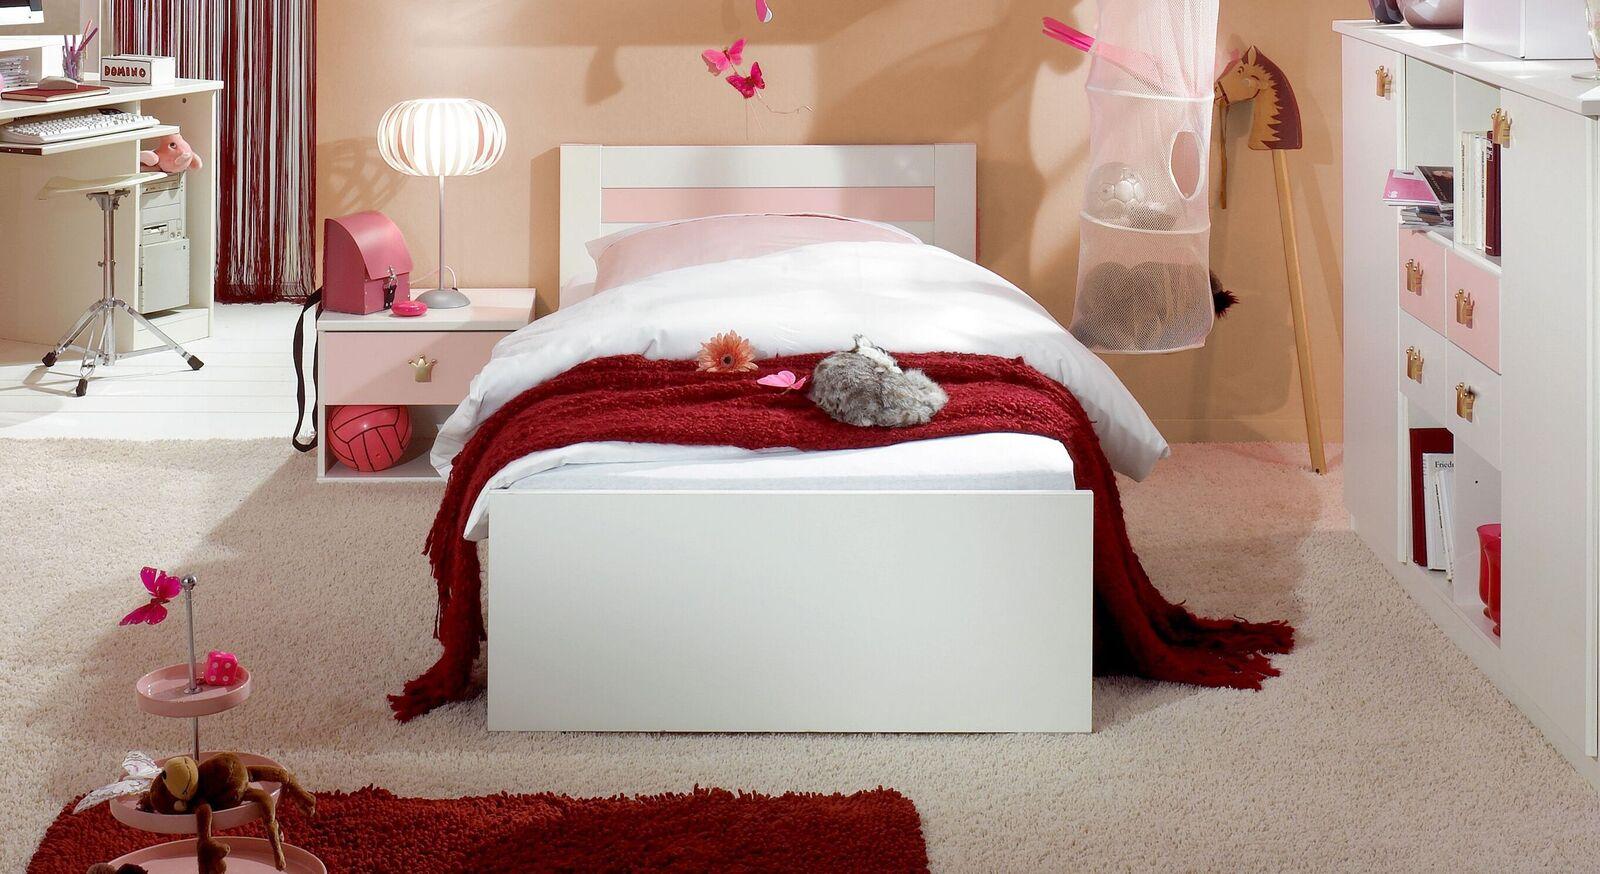 Full Size of Kinderbett Fr Mdchen Sternchen 90 200 Cm Lila Wei Mädchen Betten Bett Wohnzimmer Kinderbett Mädchen